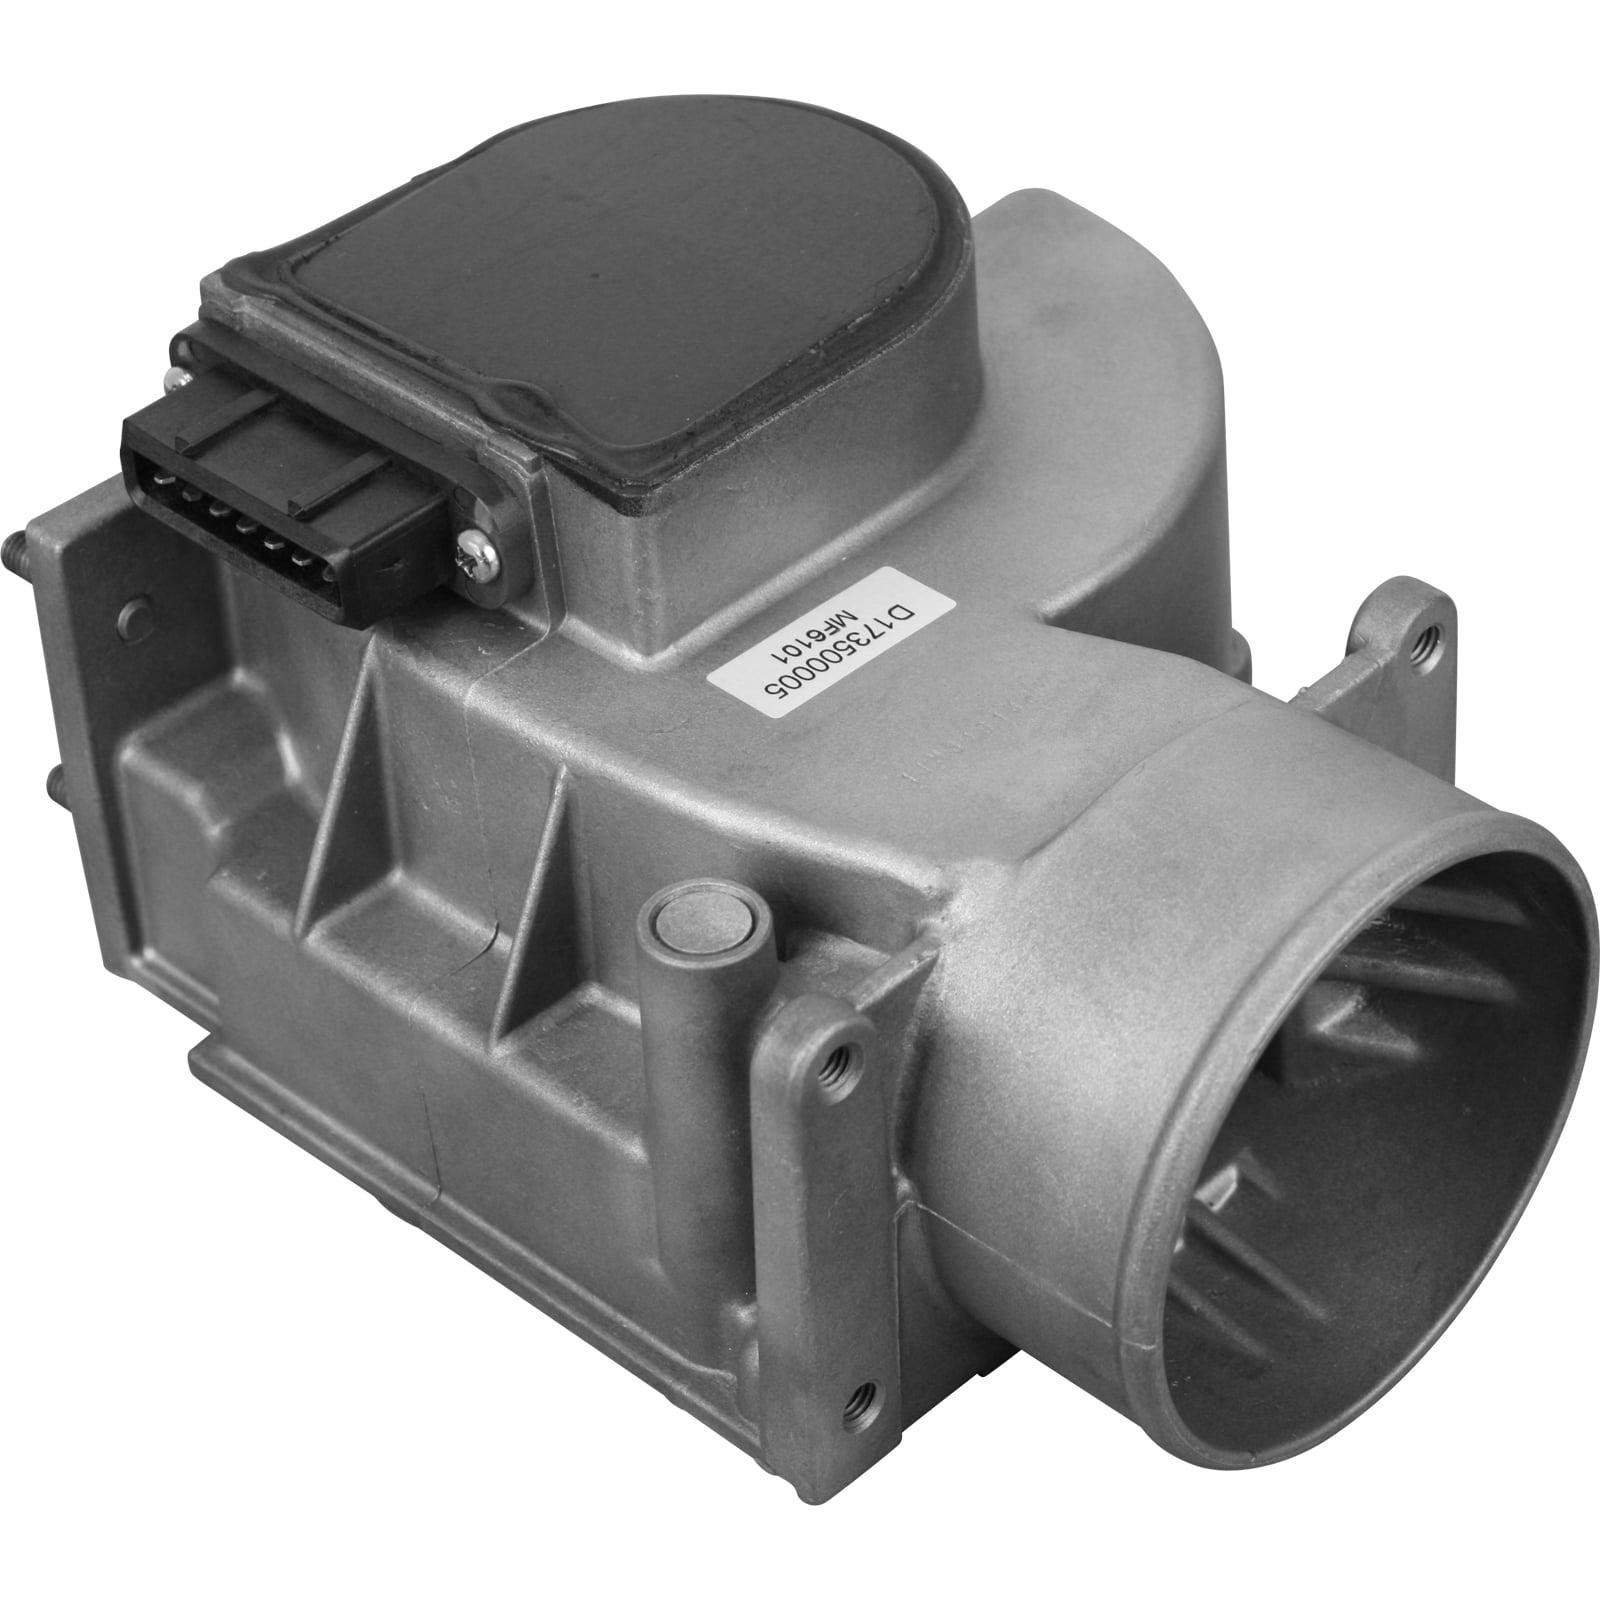 Brand New Mass Air Flow Sensor for 1988-1992 Toyota Land